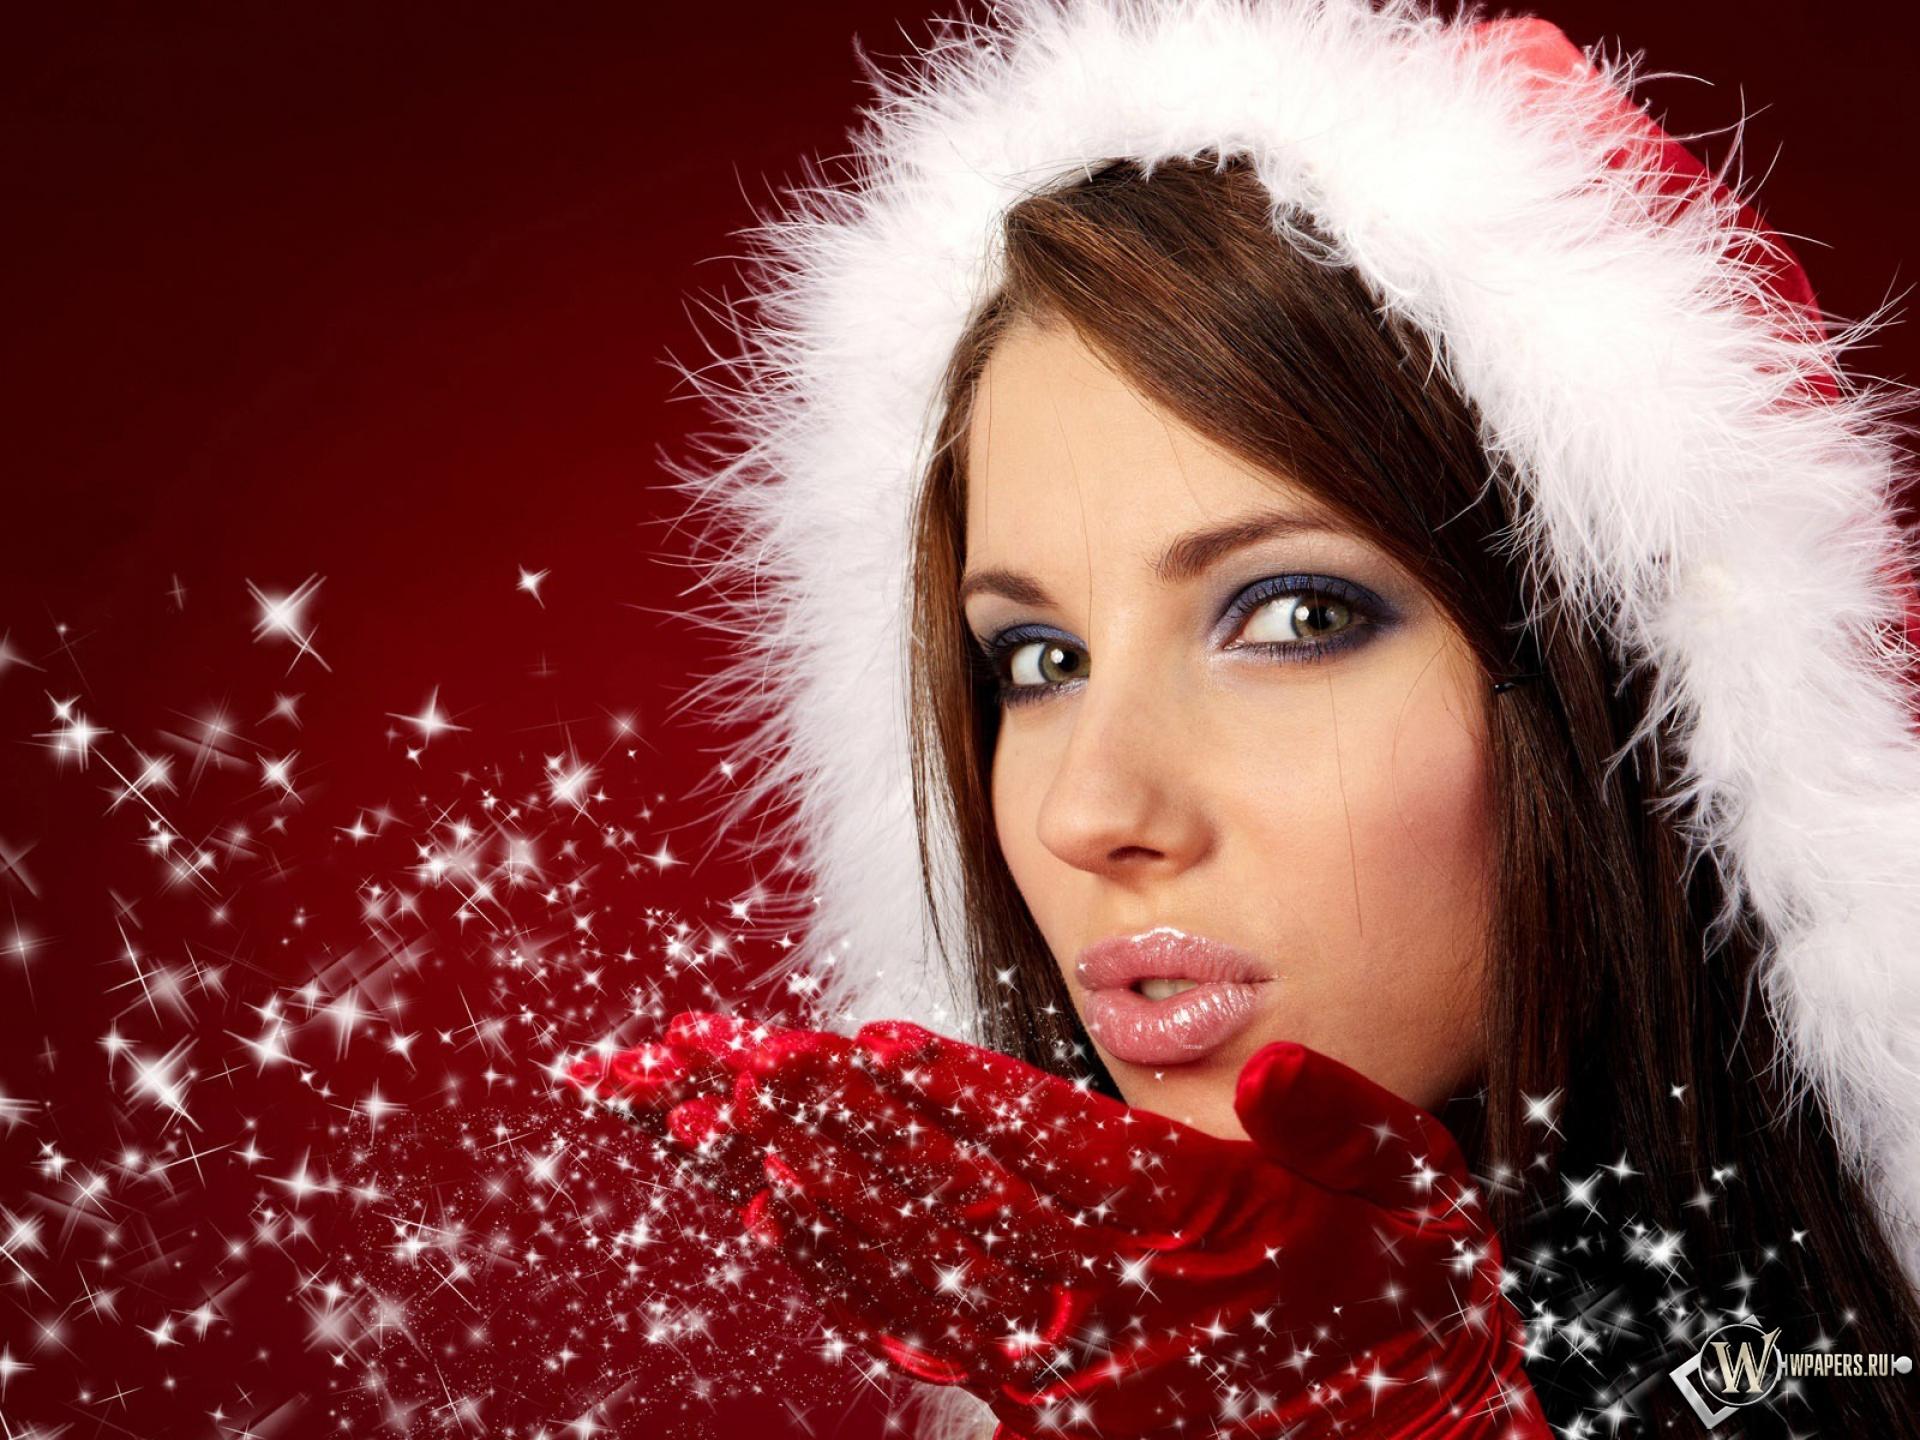 Обои, Christmas Girl, Девушка, Снегурочка, Рождество, Праздник